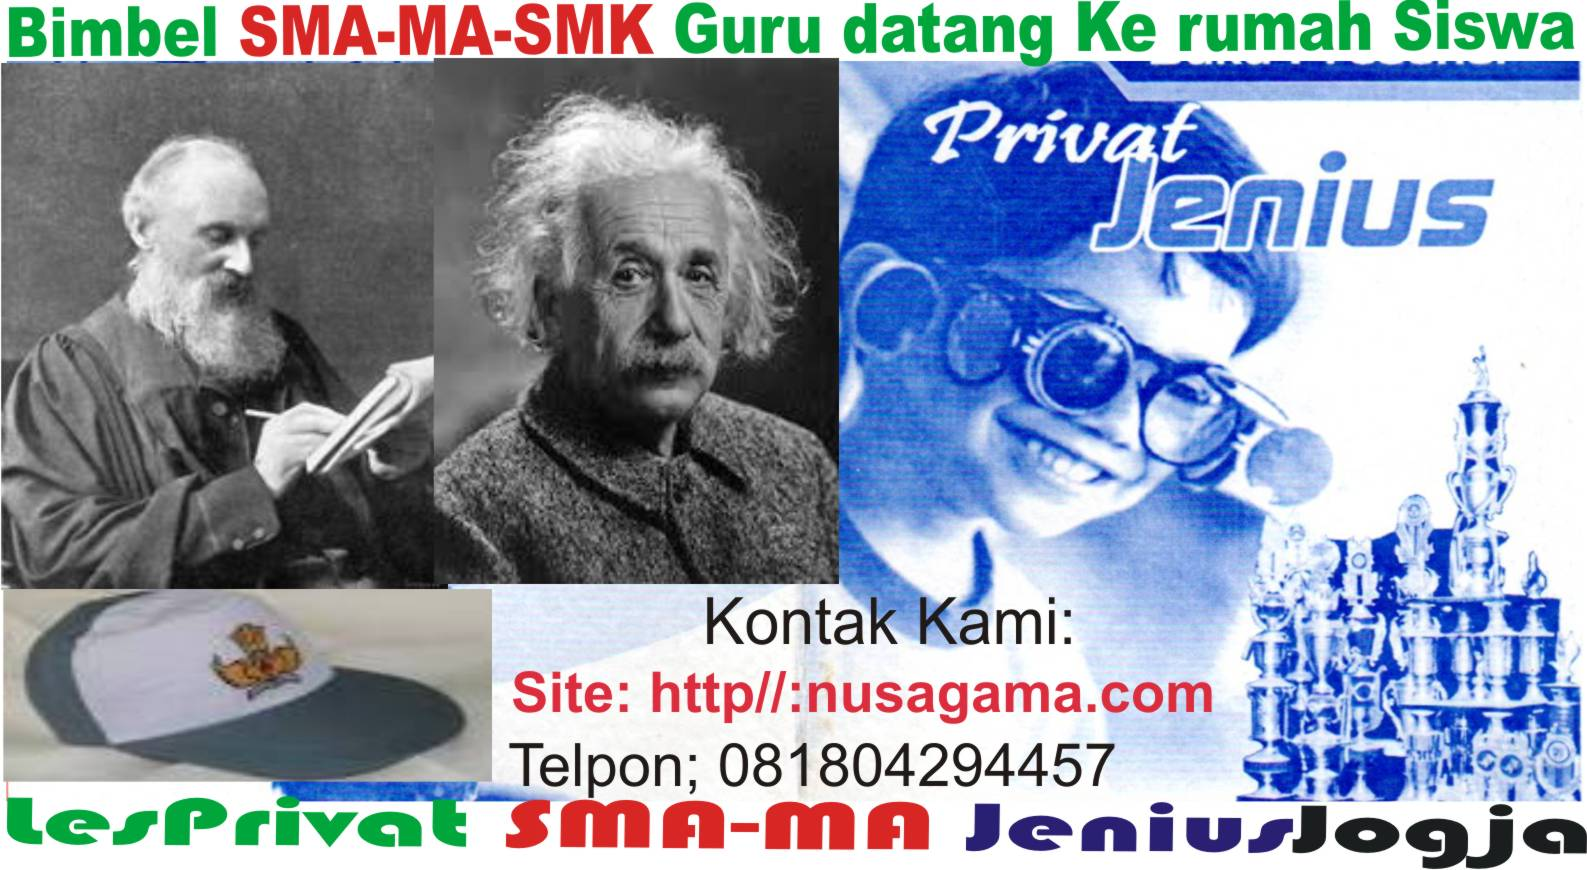 Les Privat SD SMP SMA